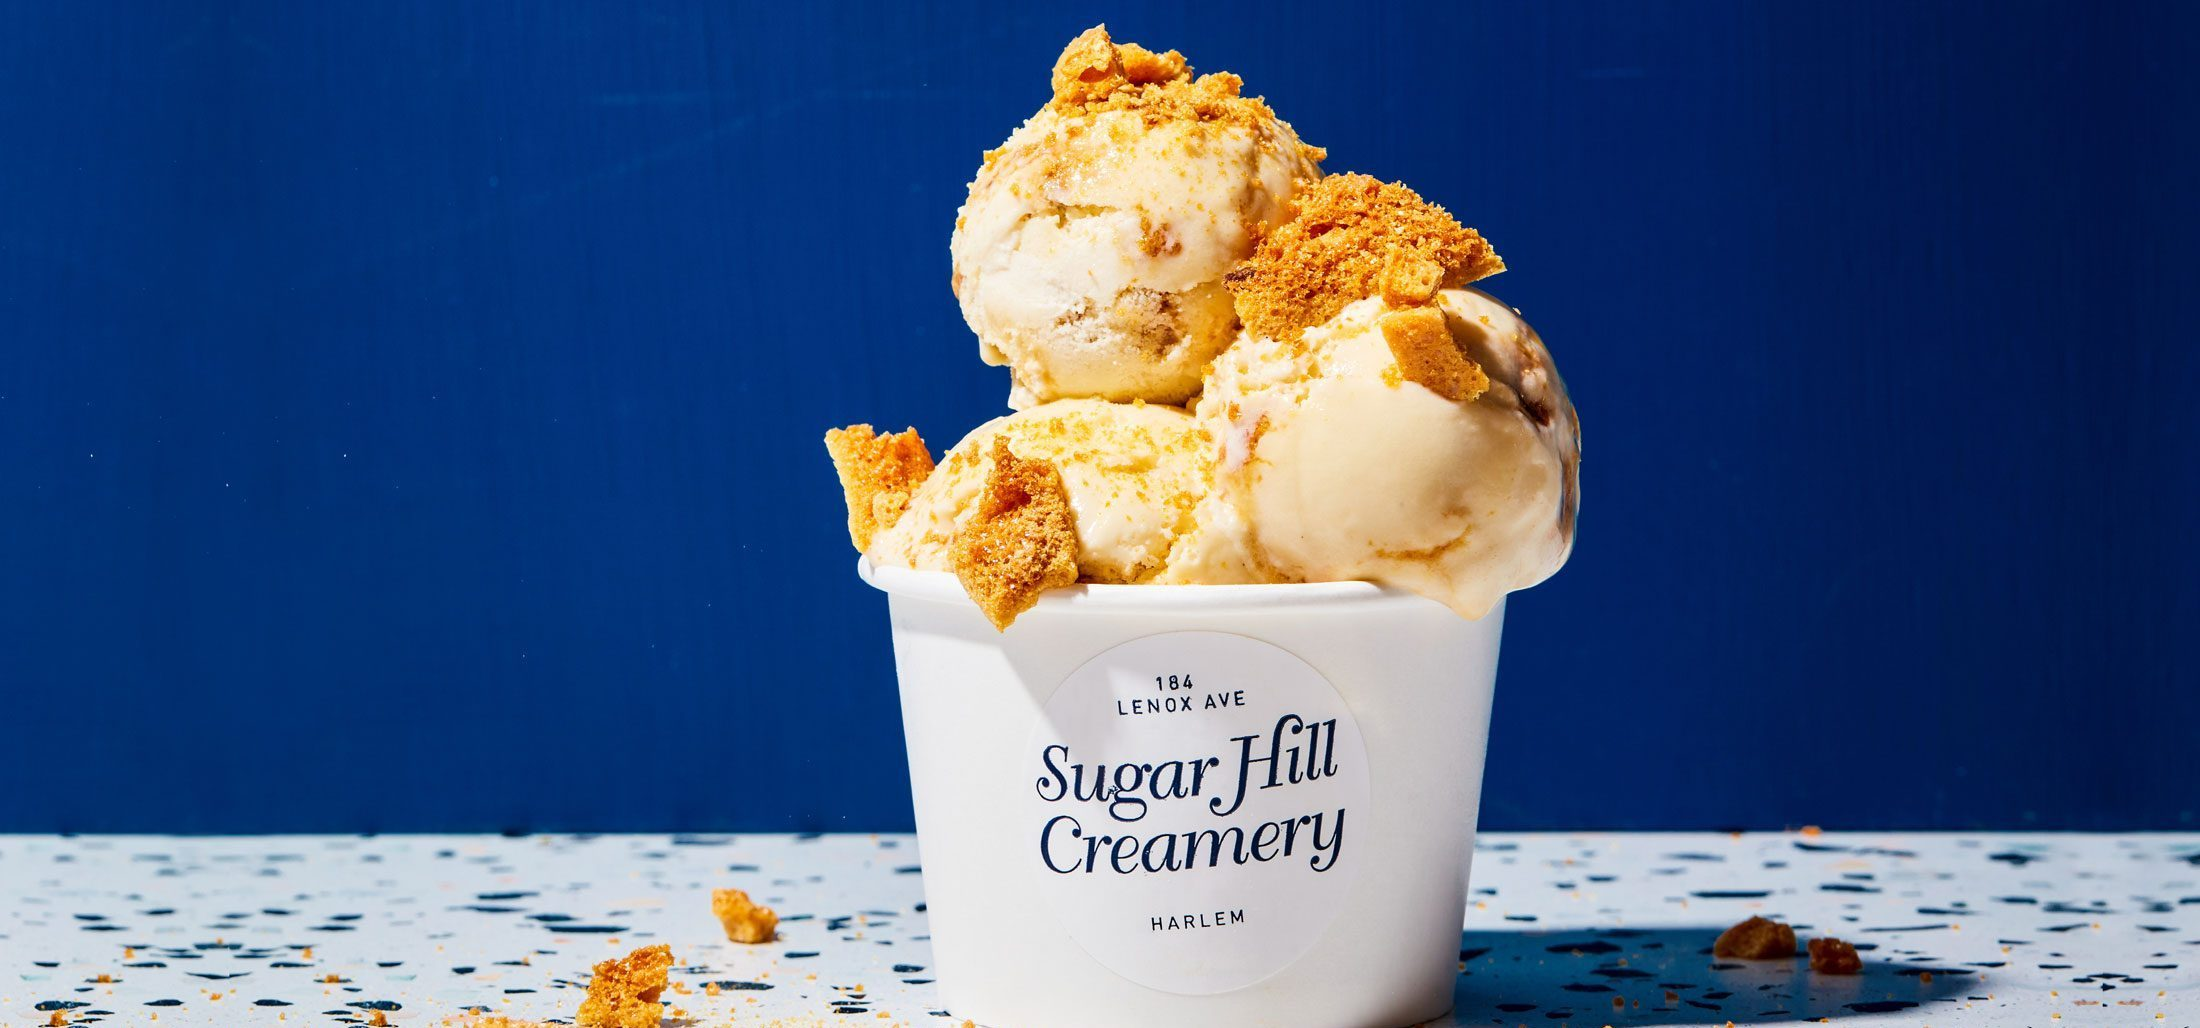 Ice cream from Sugar Hill Creamery.